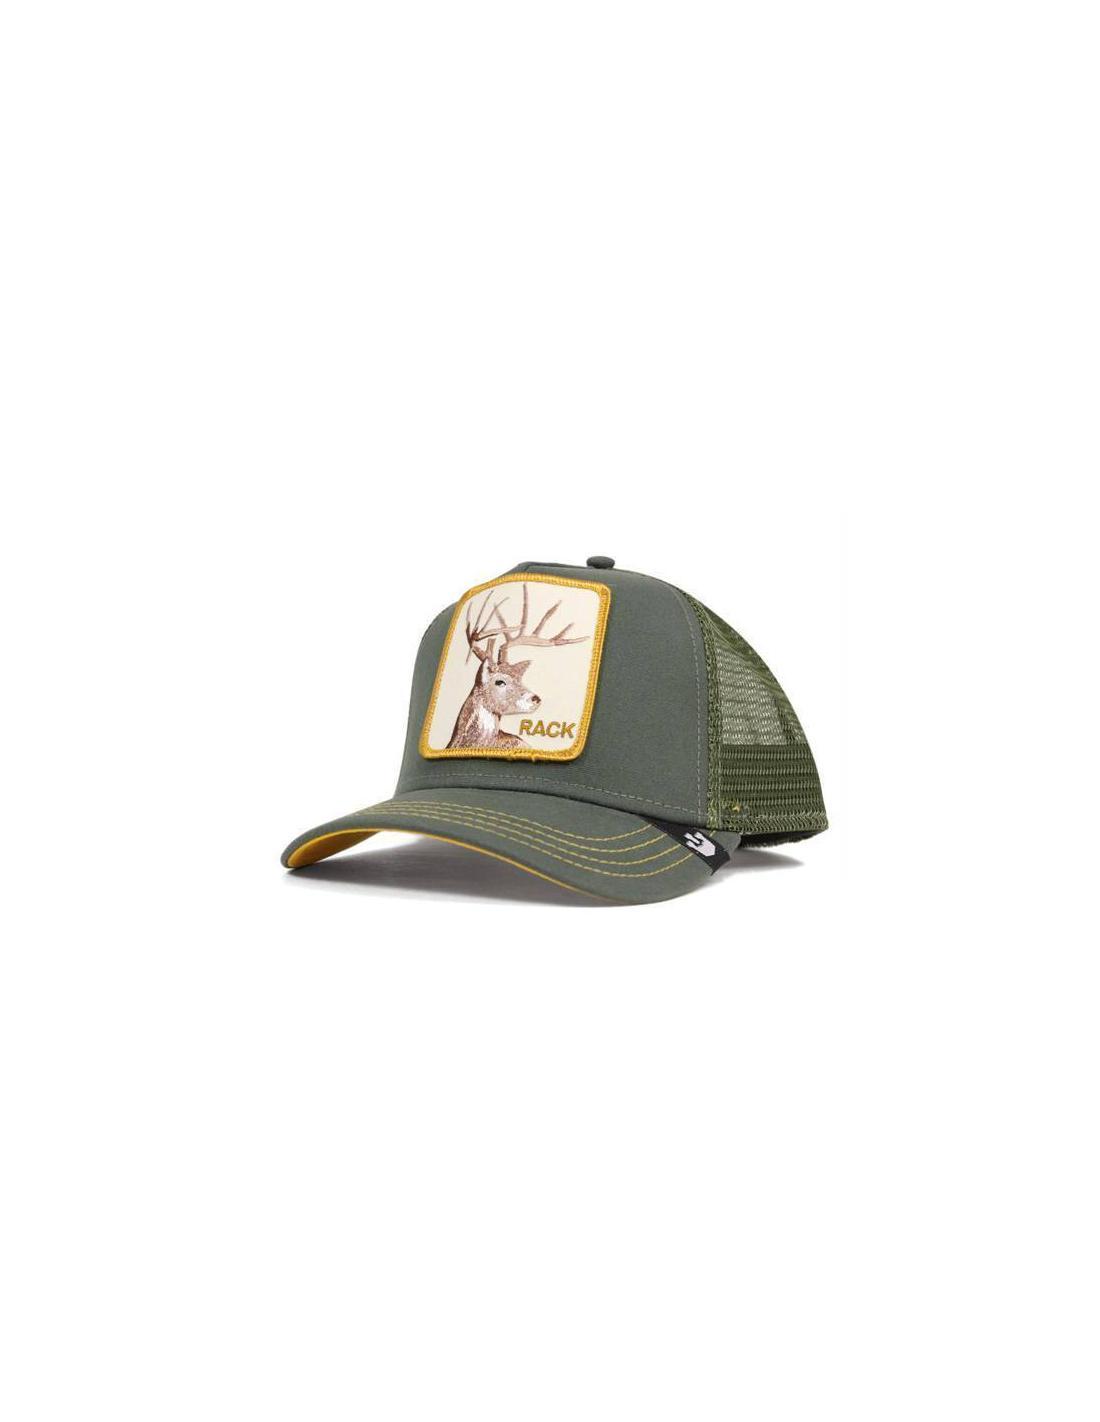 Goorin Bros Rack Olive Animal Farm Trucker Hat 9e6c0a60cd69